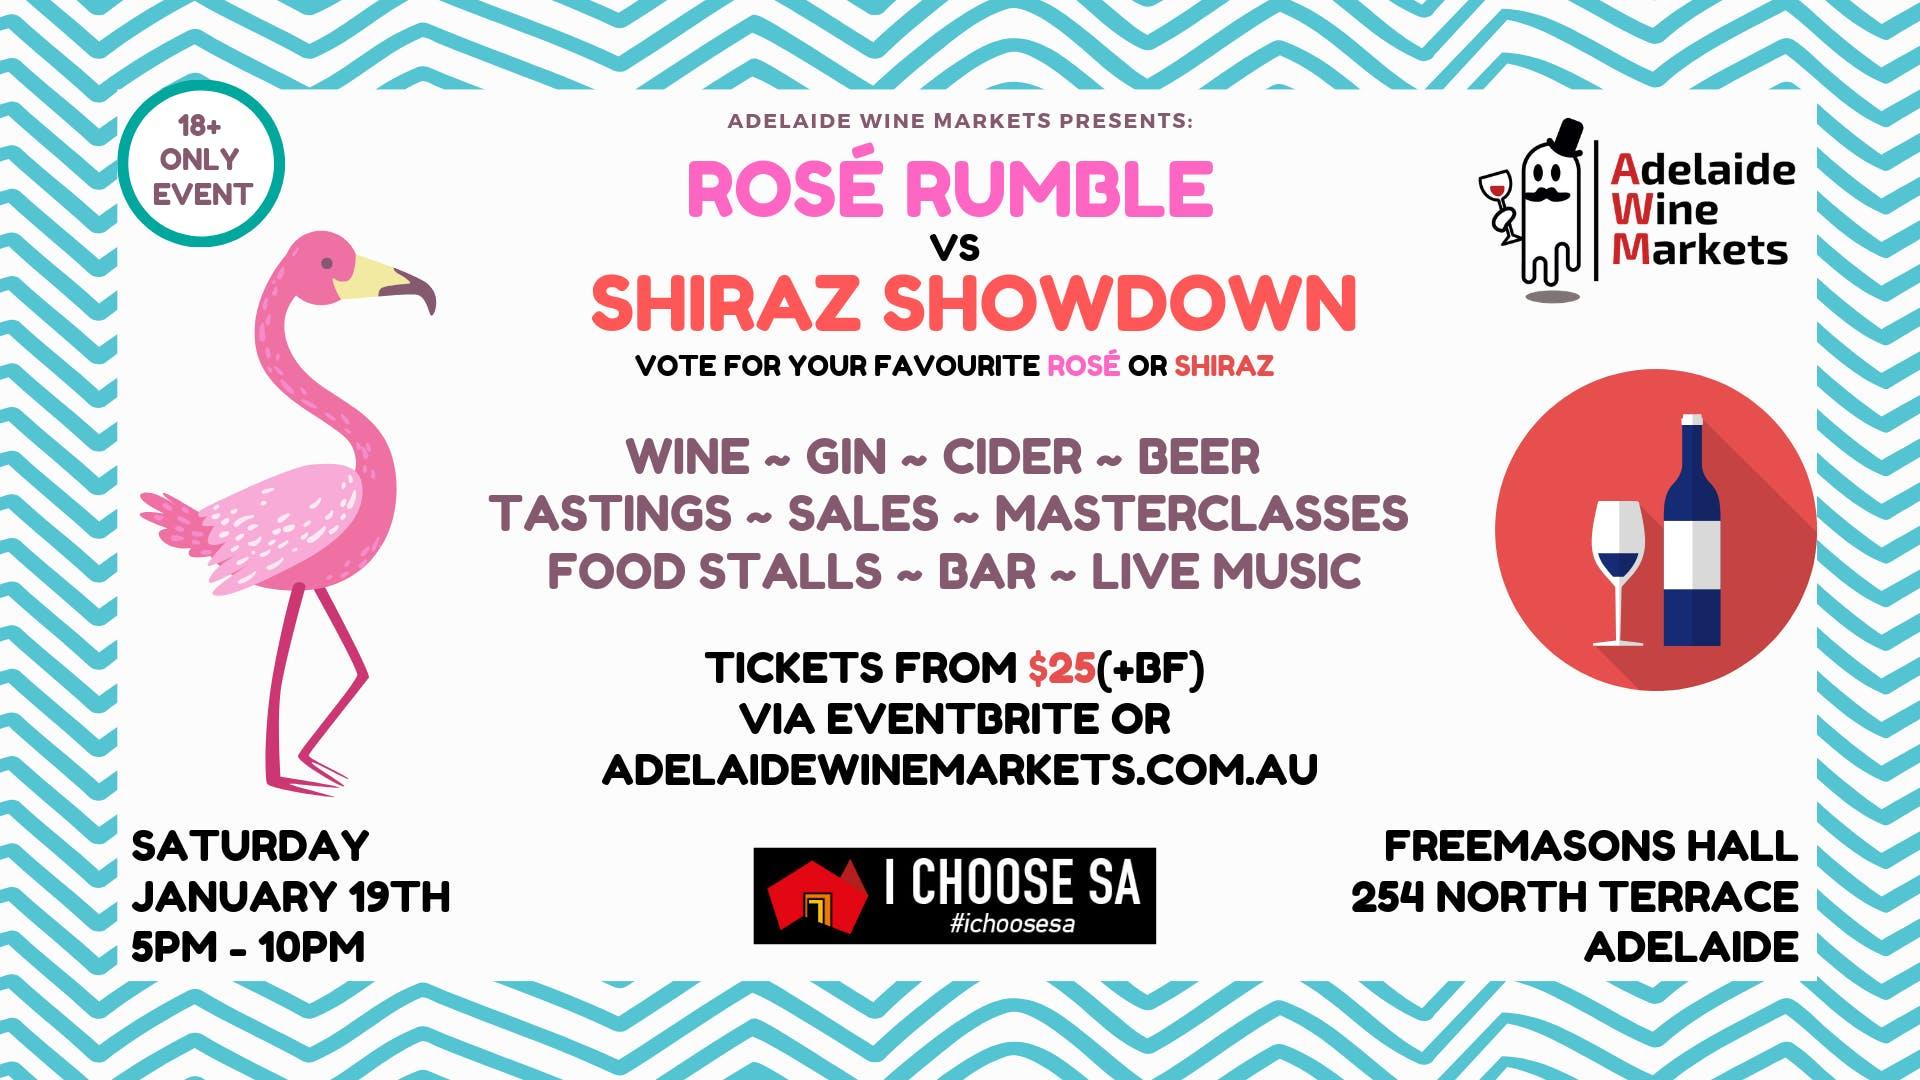 Adelaide Wine Markets - ROSÉ RUMBLE vs SHIRAZ SHOWDOWN